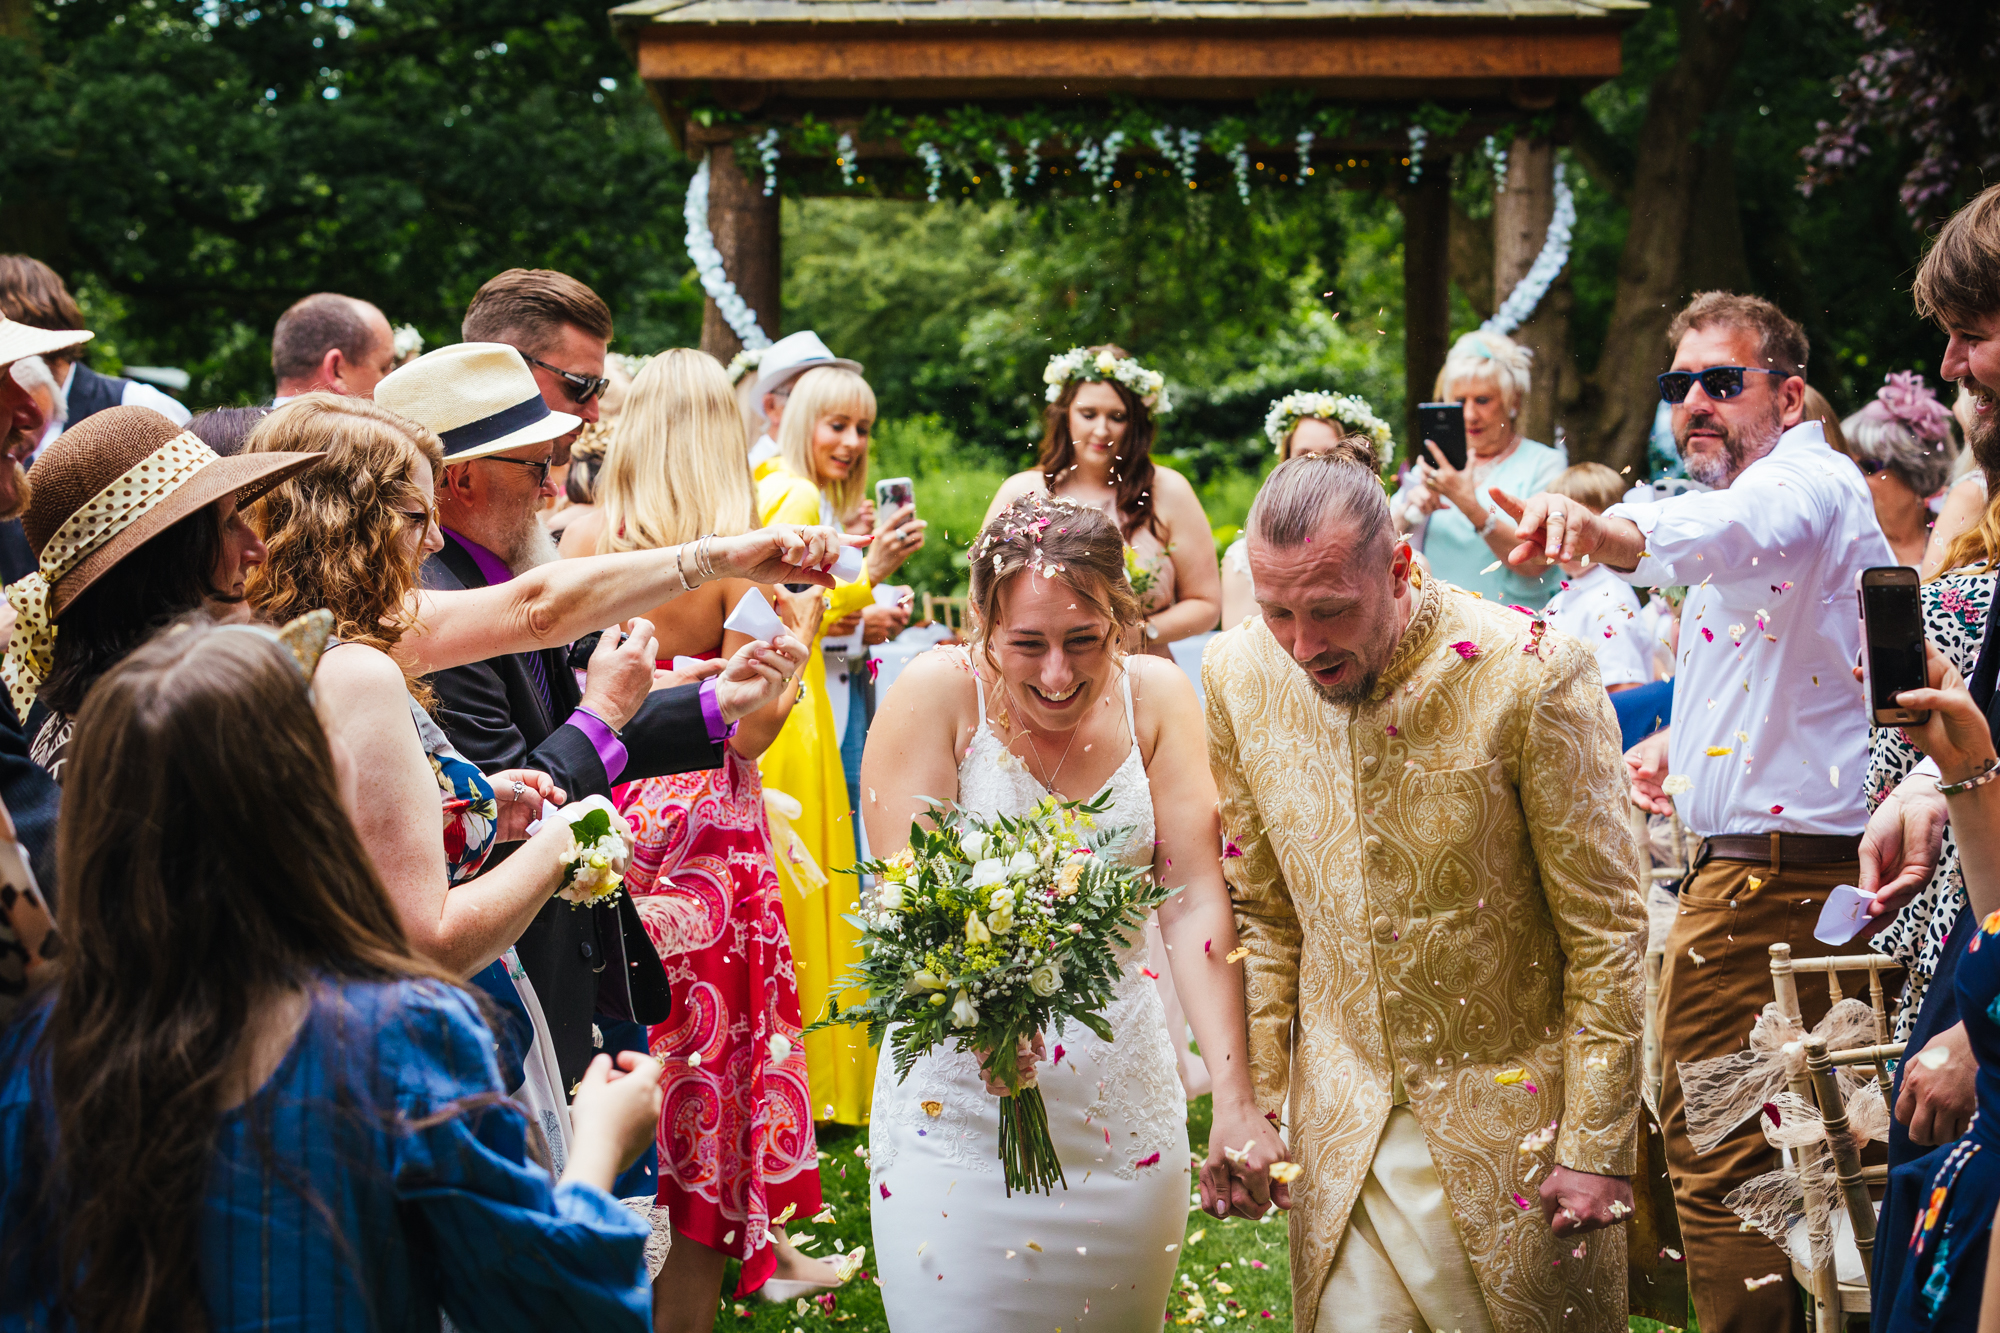 fun wedding photography - couple walking through confetti